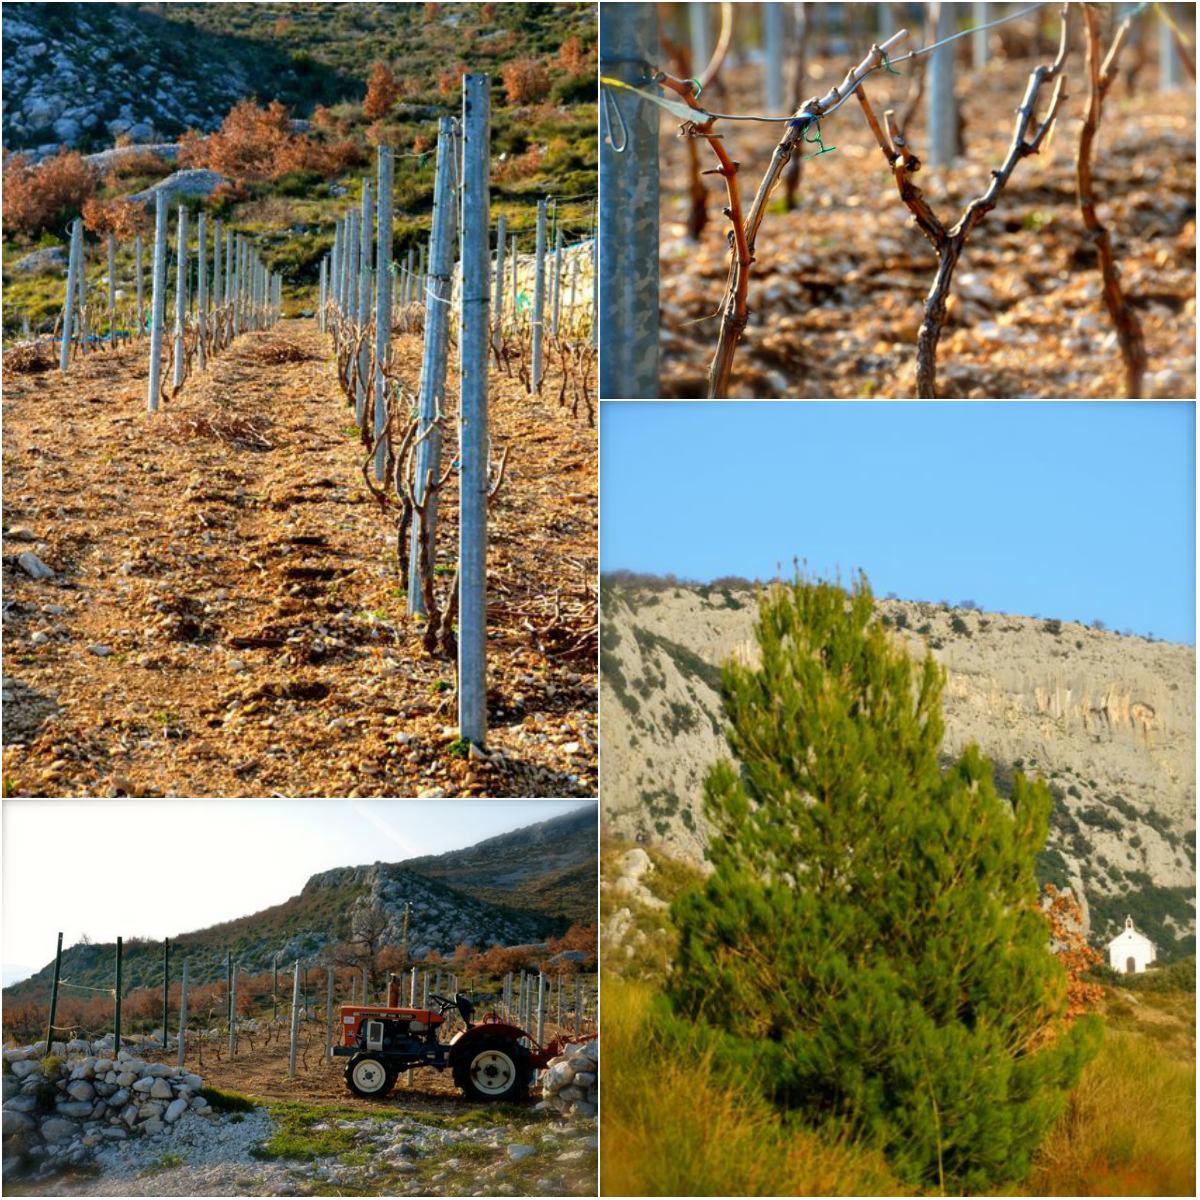 vineyards in kastela croatia tractor and landscape